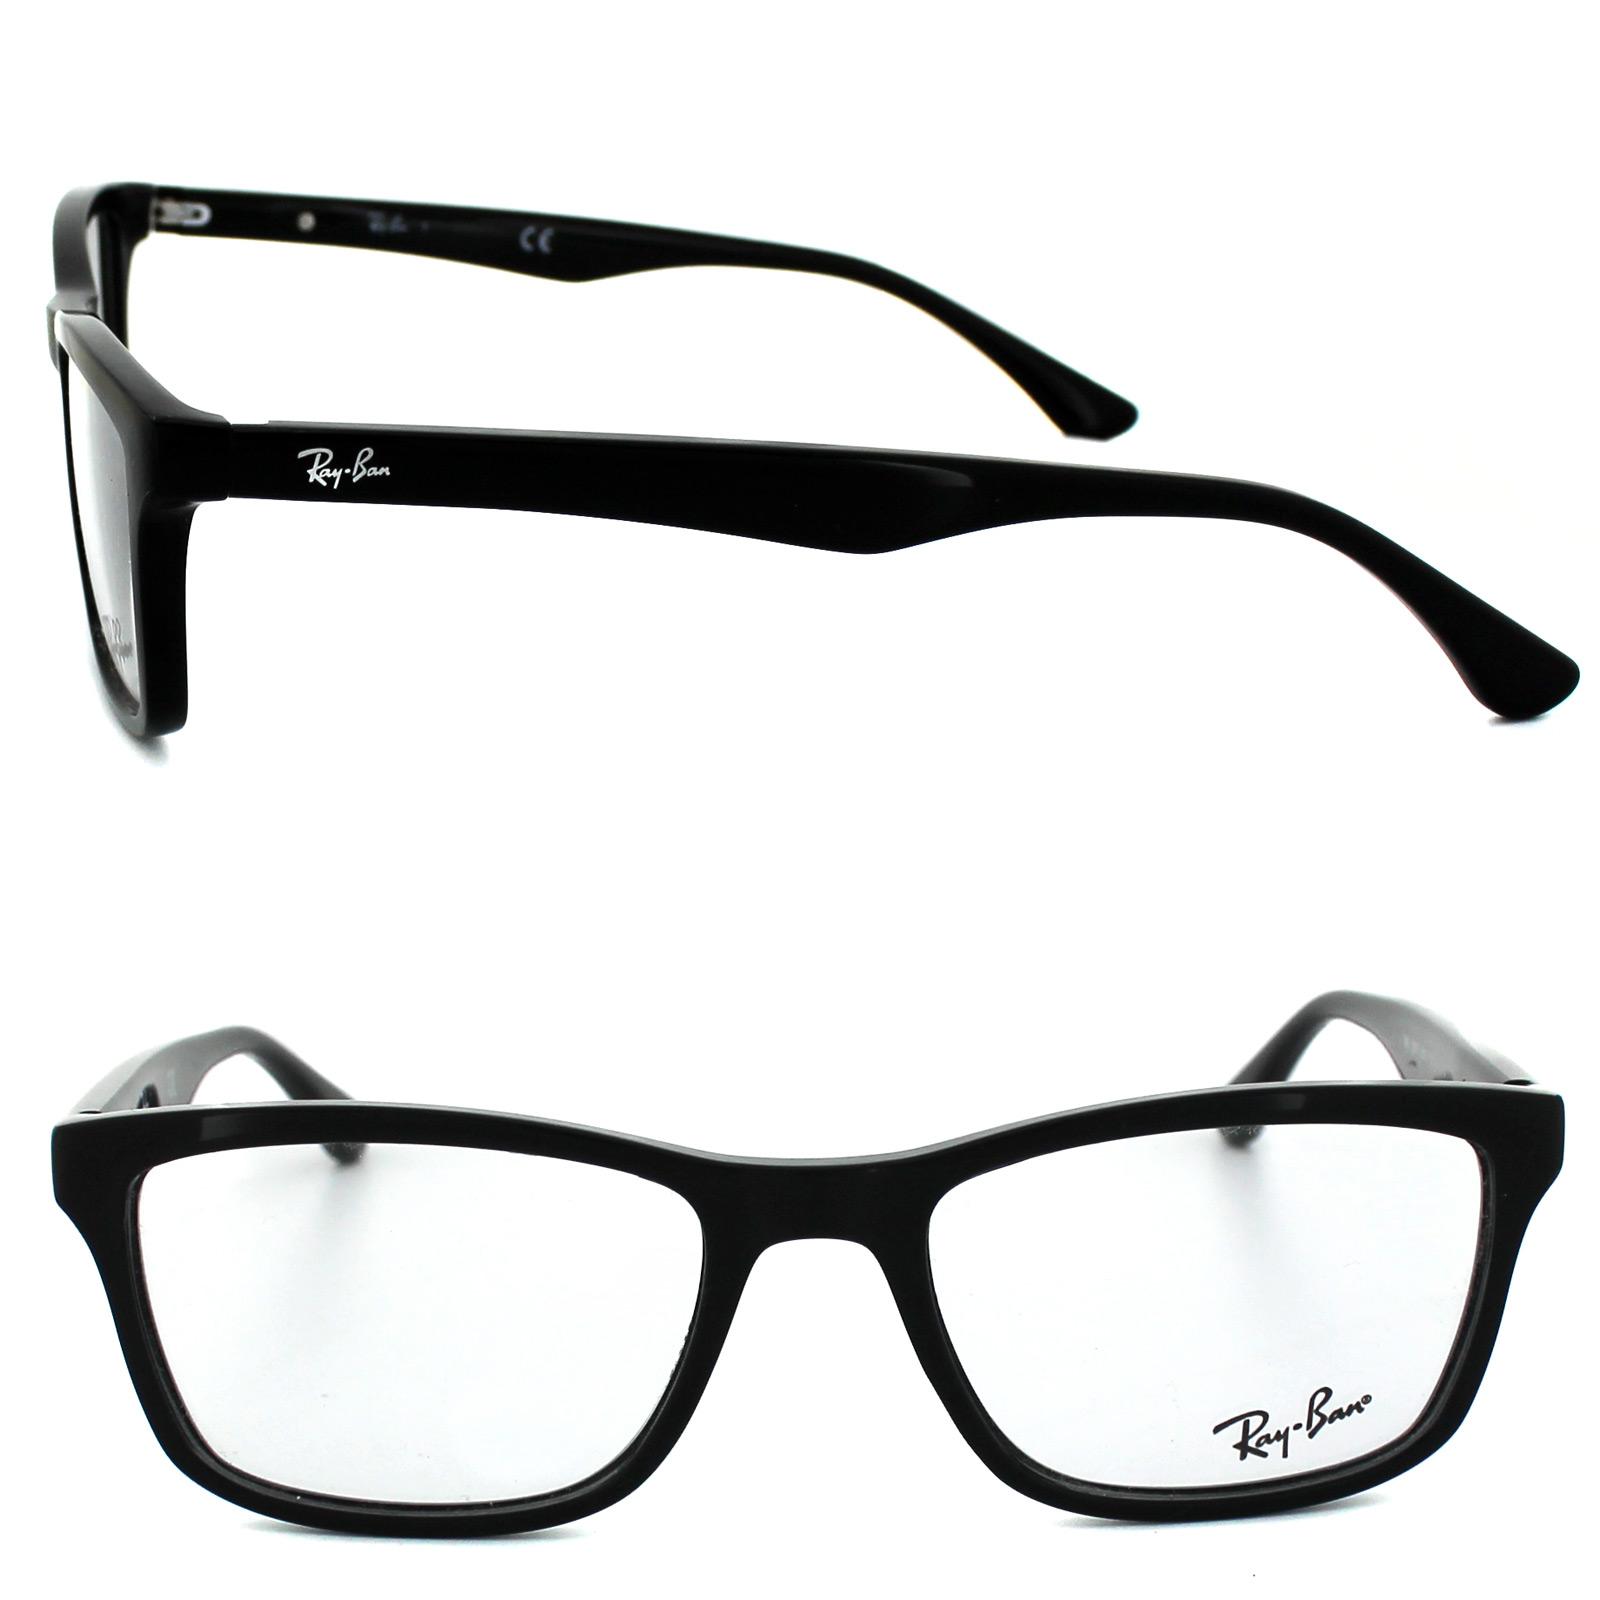 Sunglasses 2000  ray ban glasses frames 5279 2000 shiny black